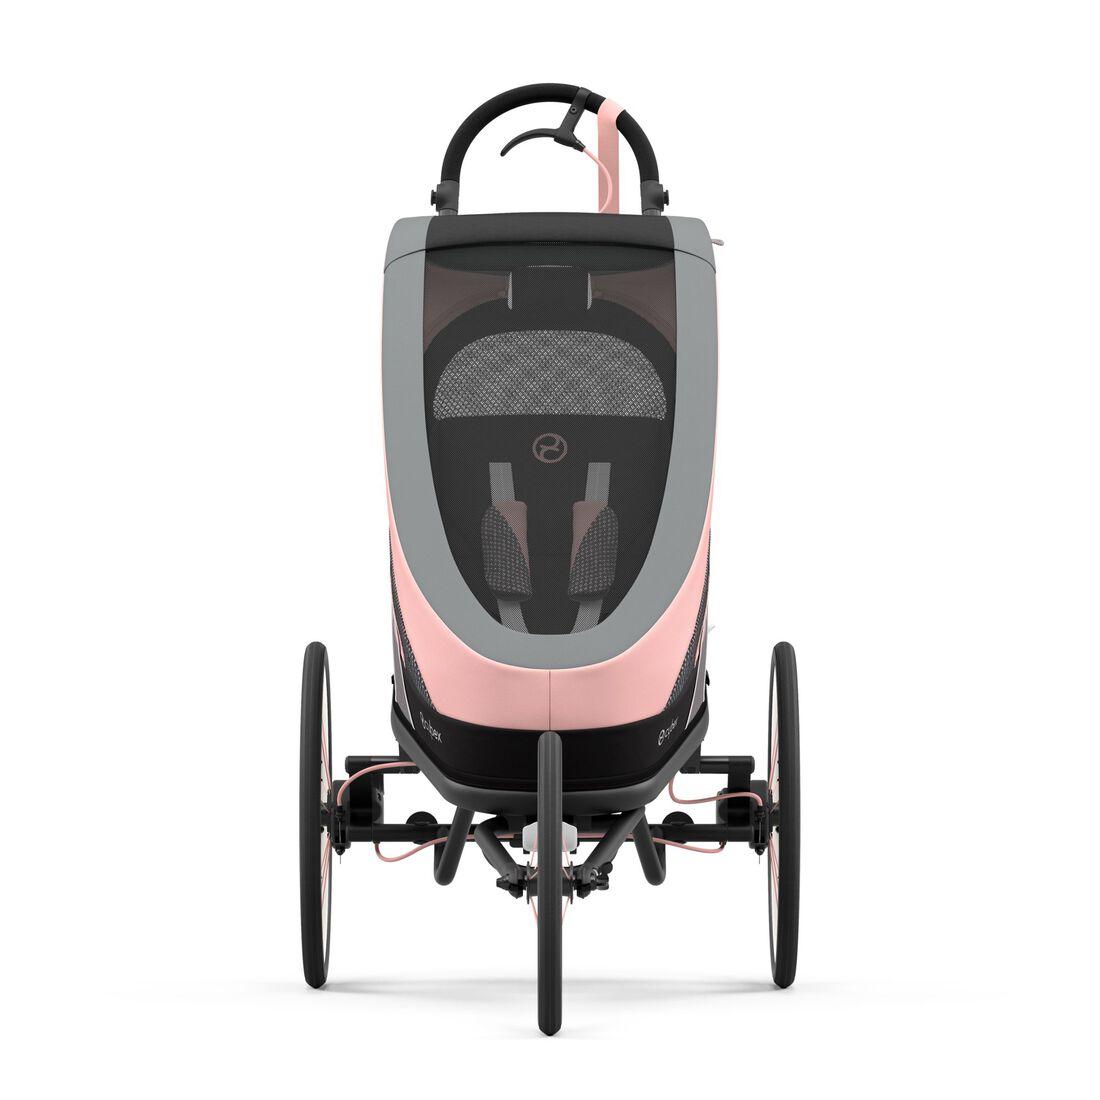 CYBEX Zeno Sitzpaket - Silver Pink in Silver Pink large Bild 3